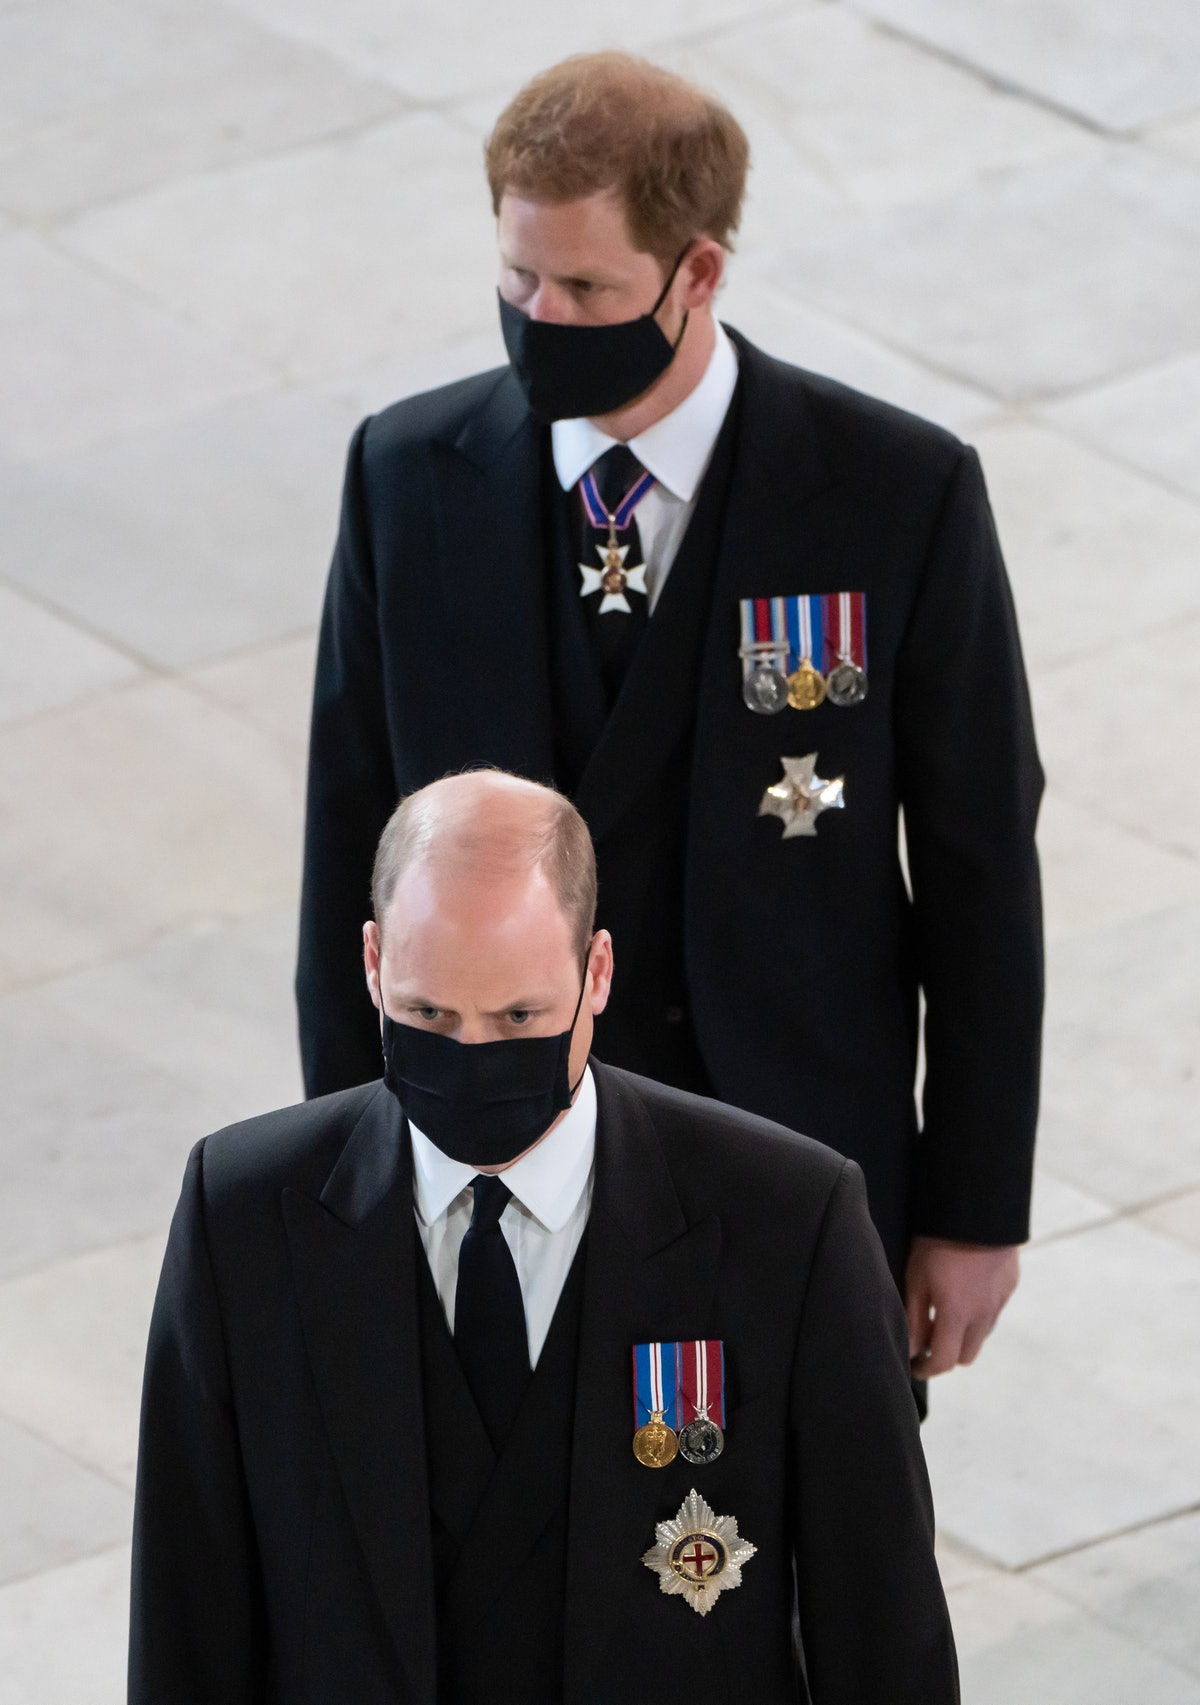 WINDSOR, ENGLAND - APRIL 17: Prince William, Duke of Cambridge and Prince Harry, Duke of Sussex foll...